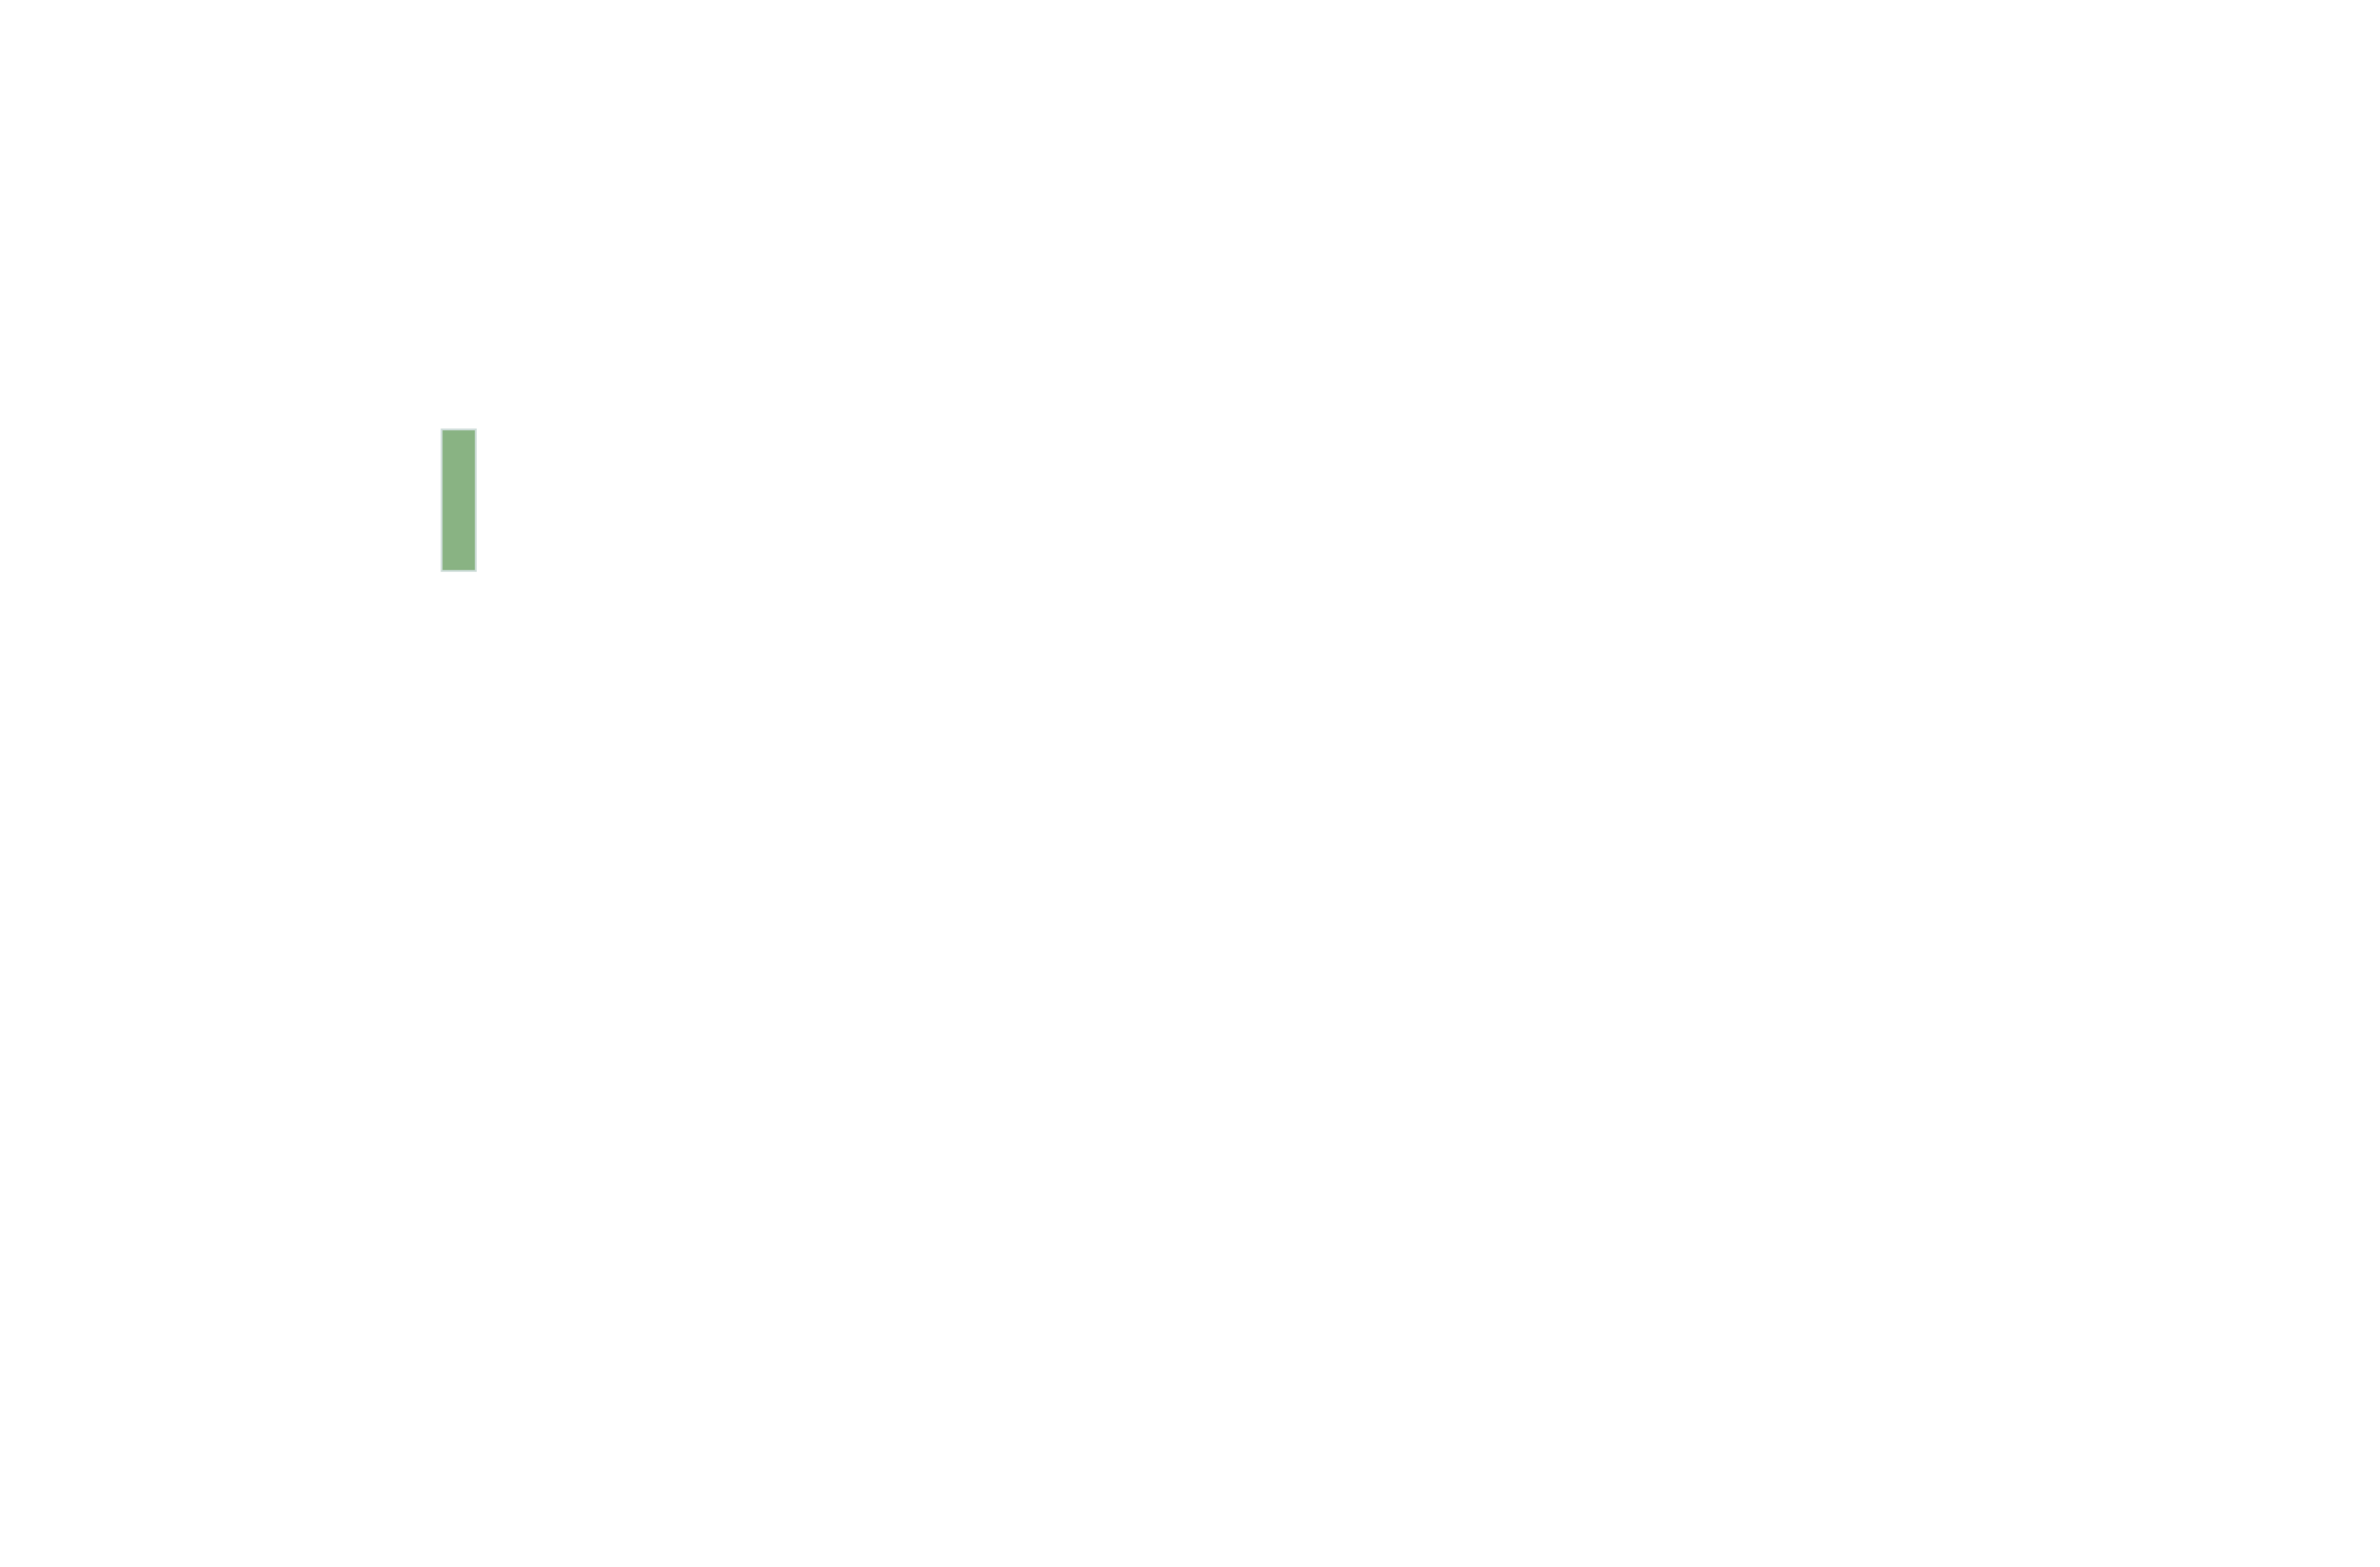 Unit e005